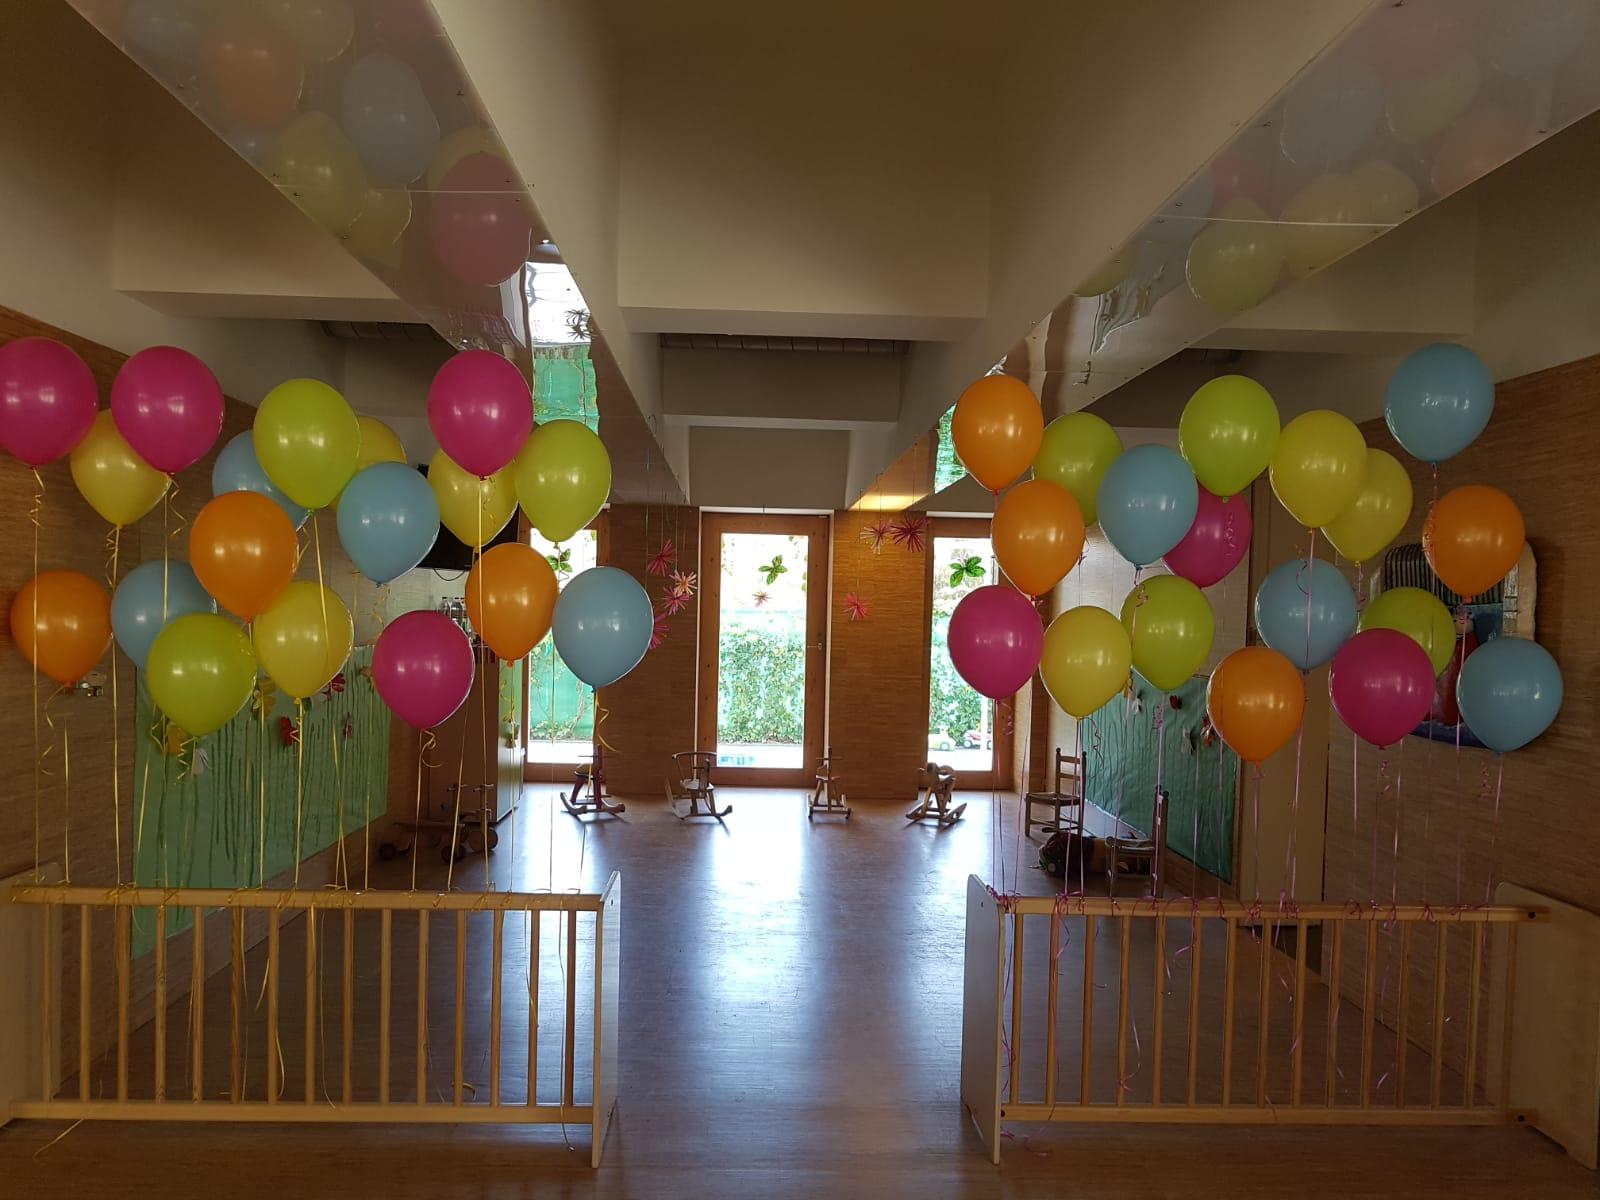 Globus a la sala central.